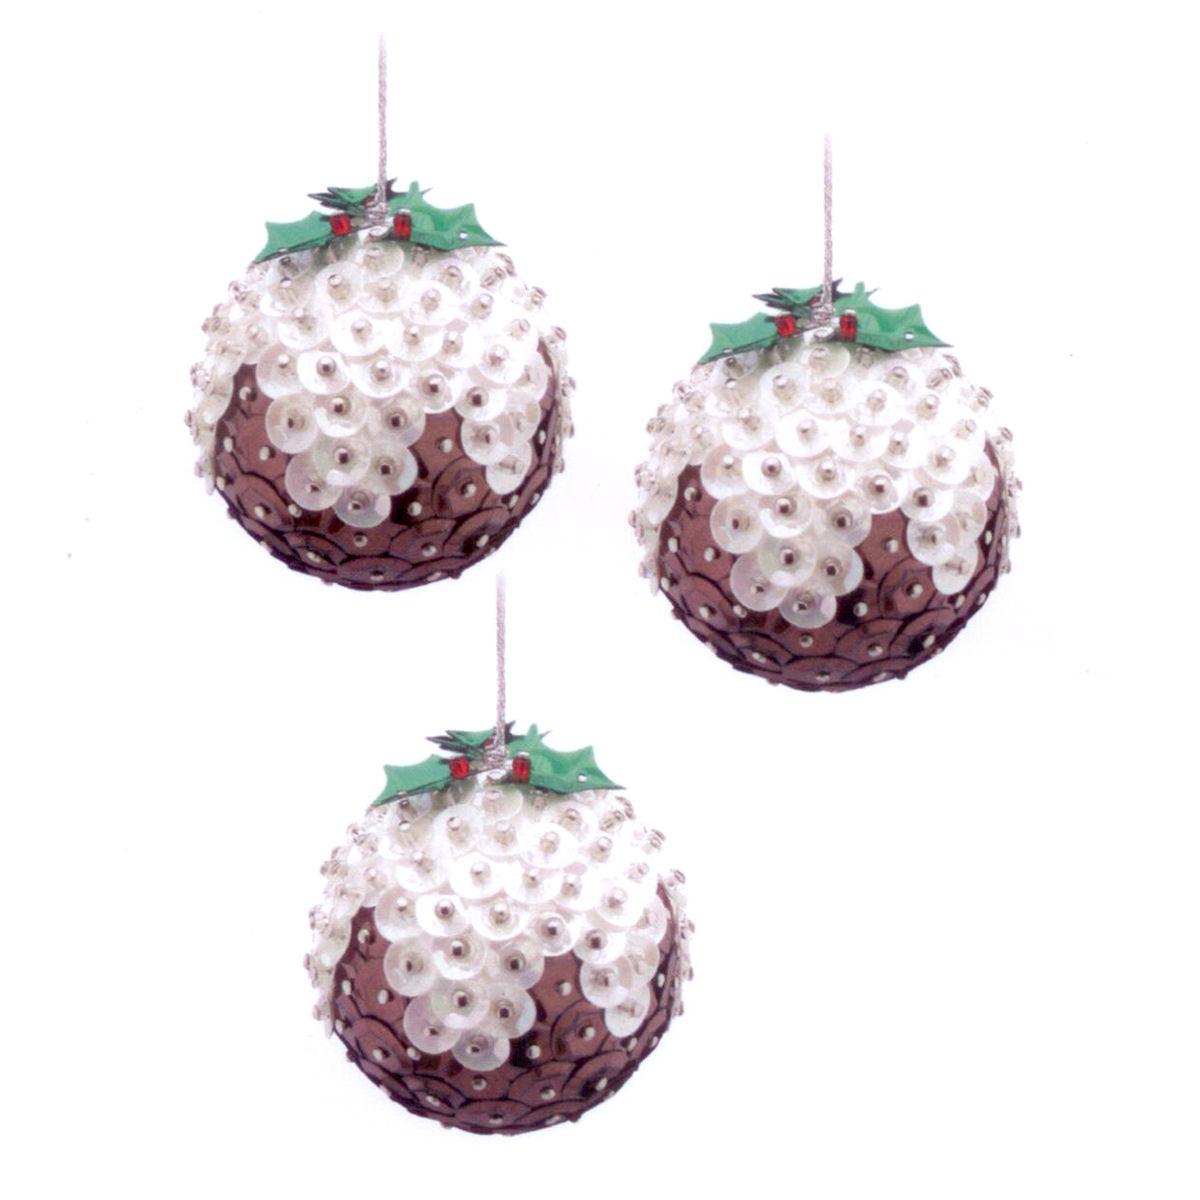 Pinflair Xmas Decoration Kit Mini Christmas Puddings Enlarged Preview